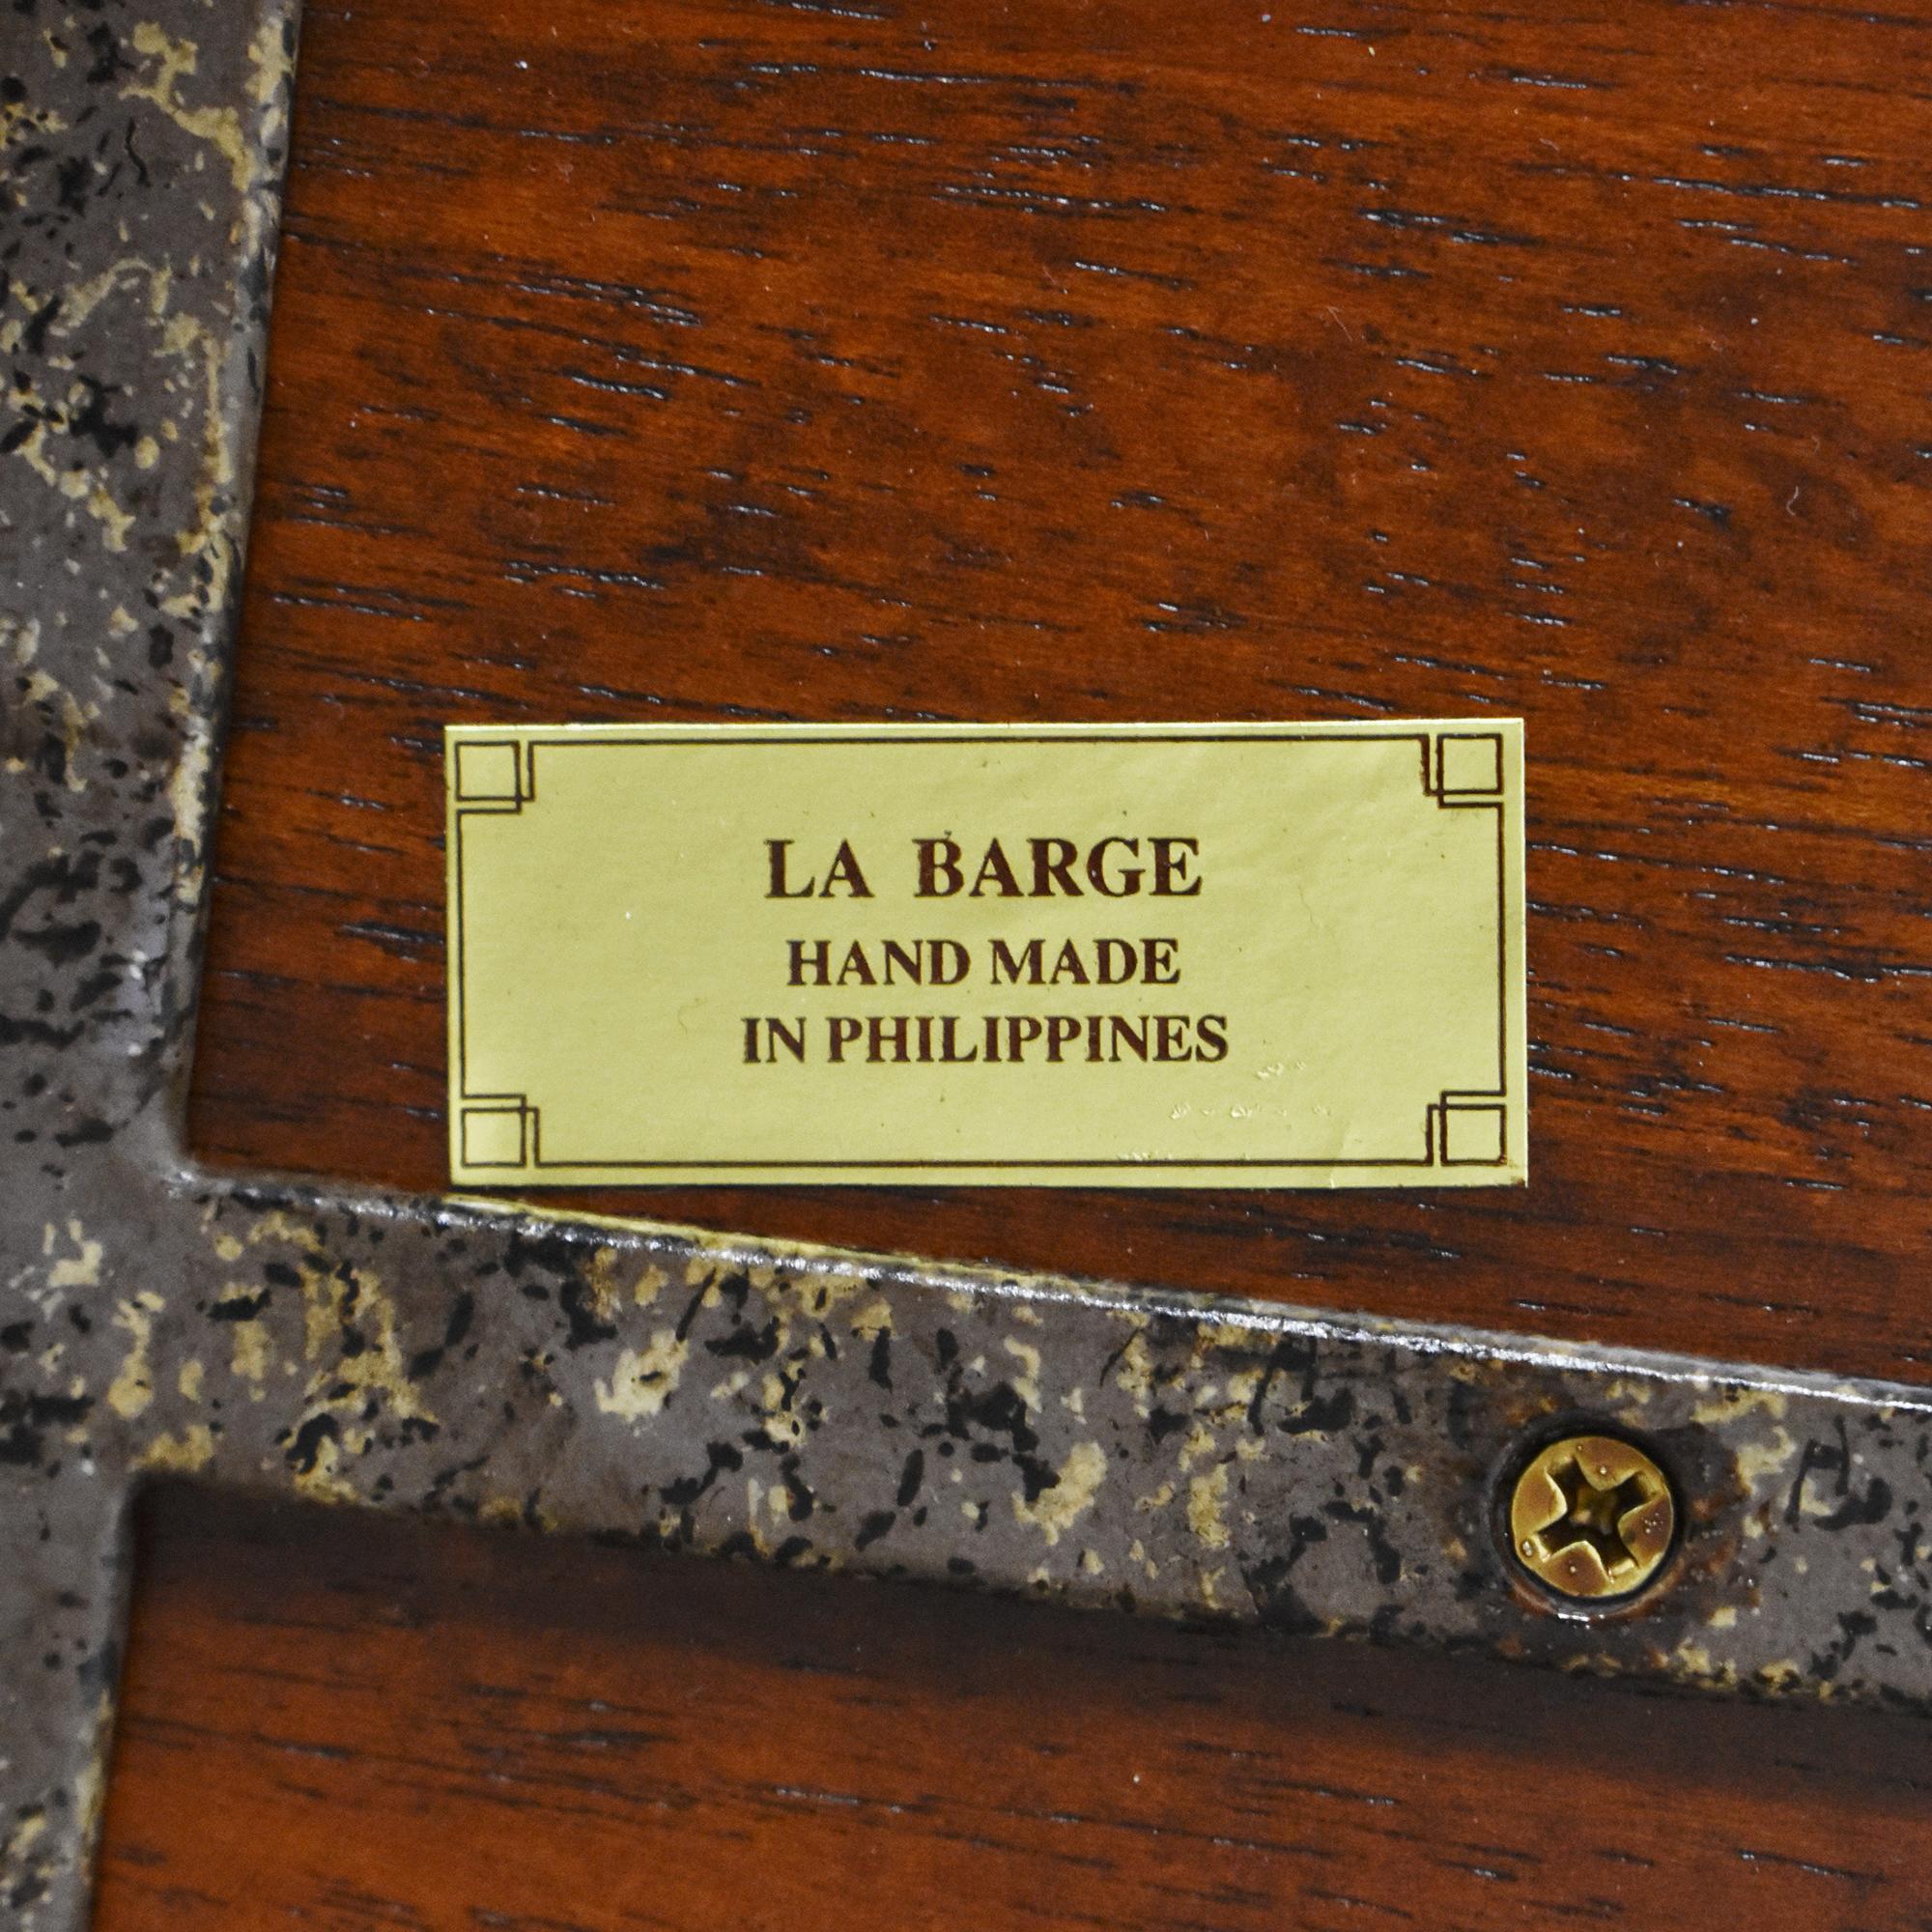 La Barge La Barge Cherub Side Table second hand